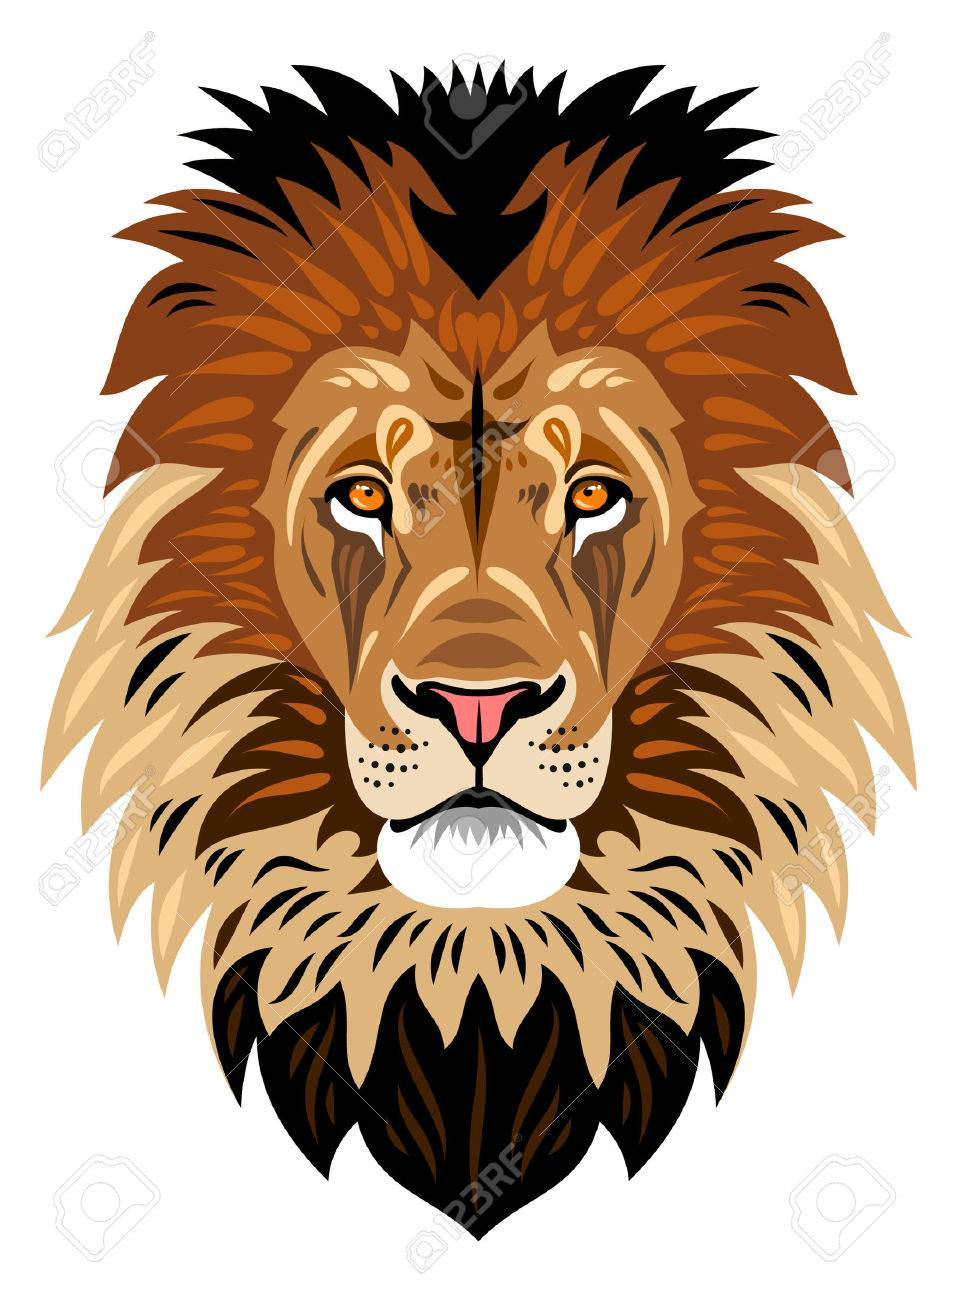 The muzzle of a lion - 53425802